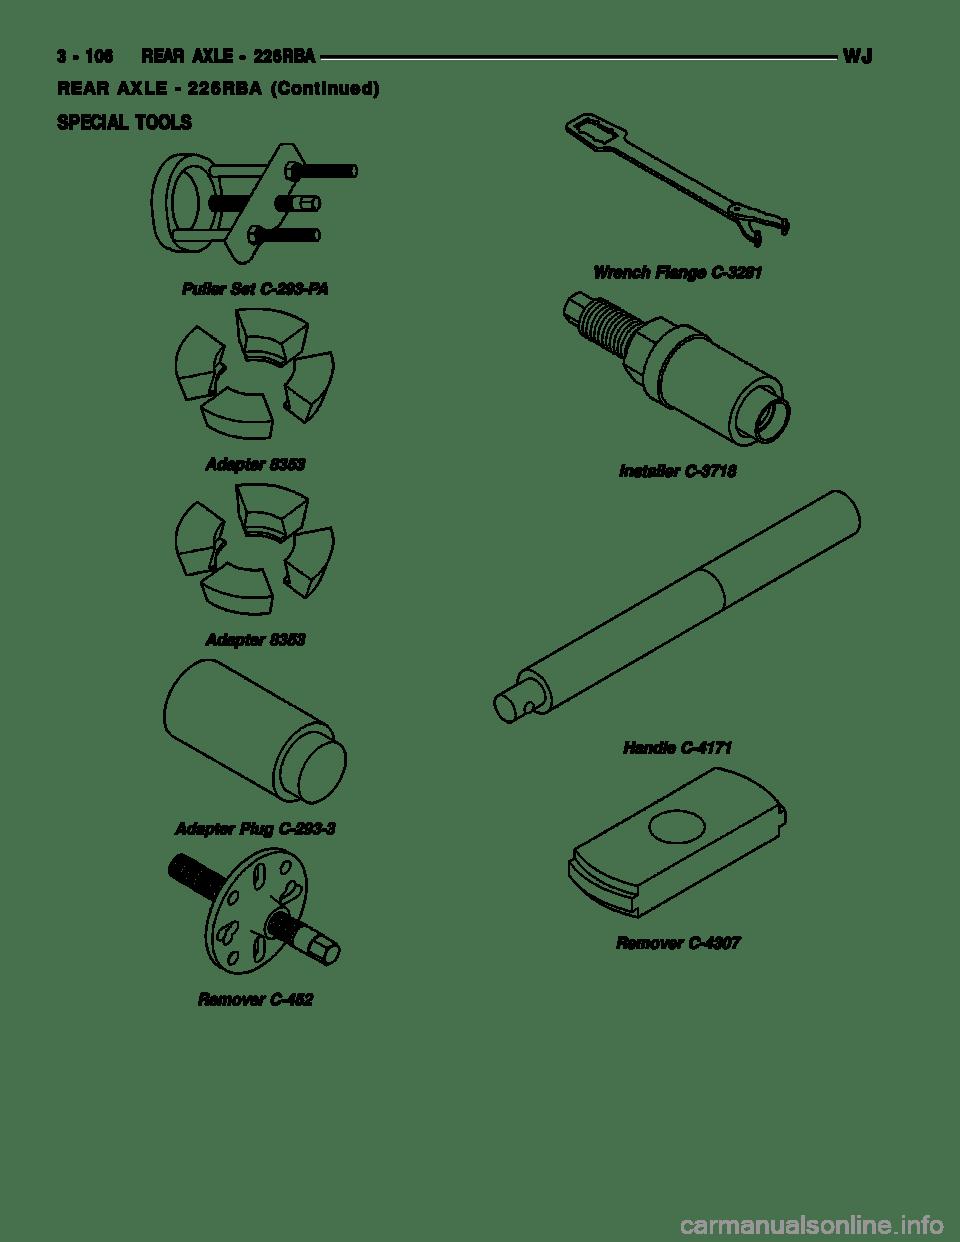 JEEP GRAND CHEROKEE 2002 WJ / 2.G Workshop Manual (2199